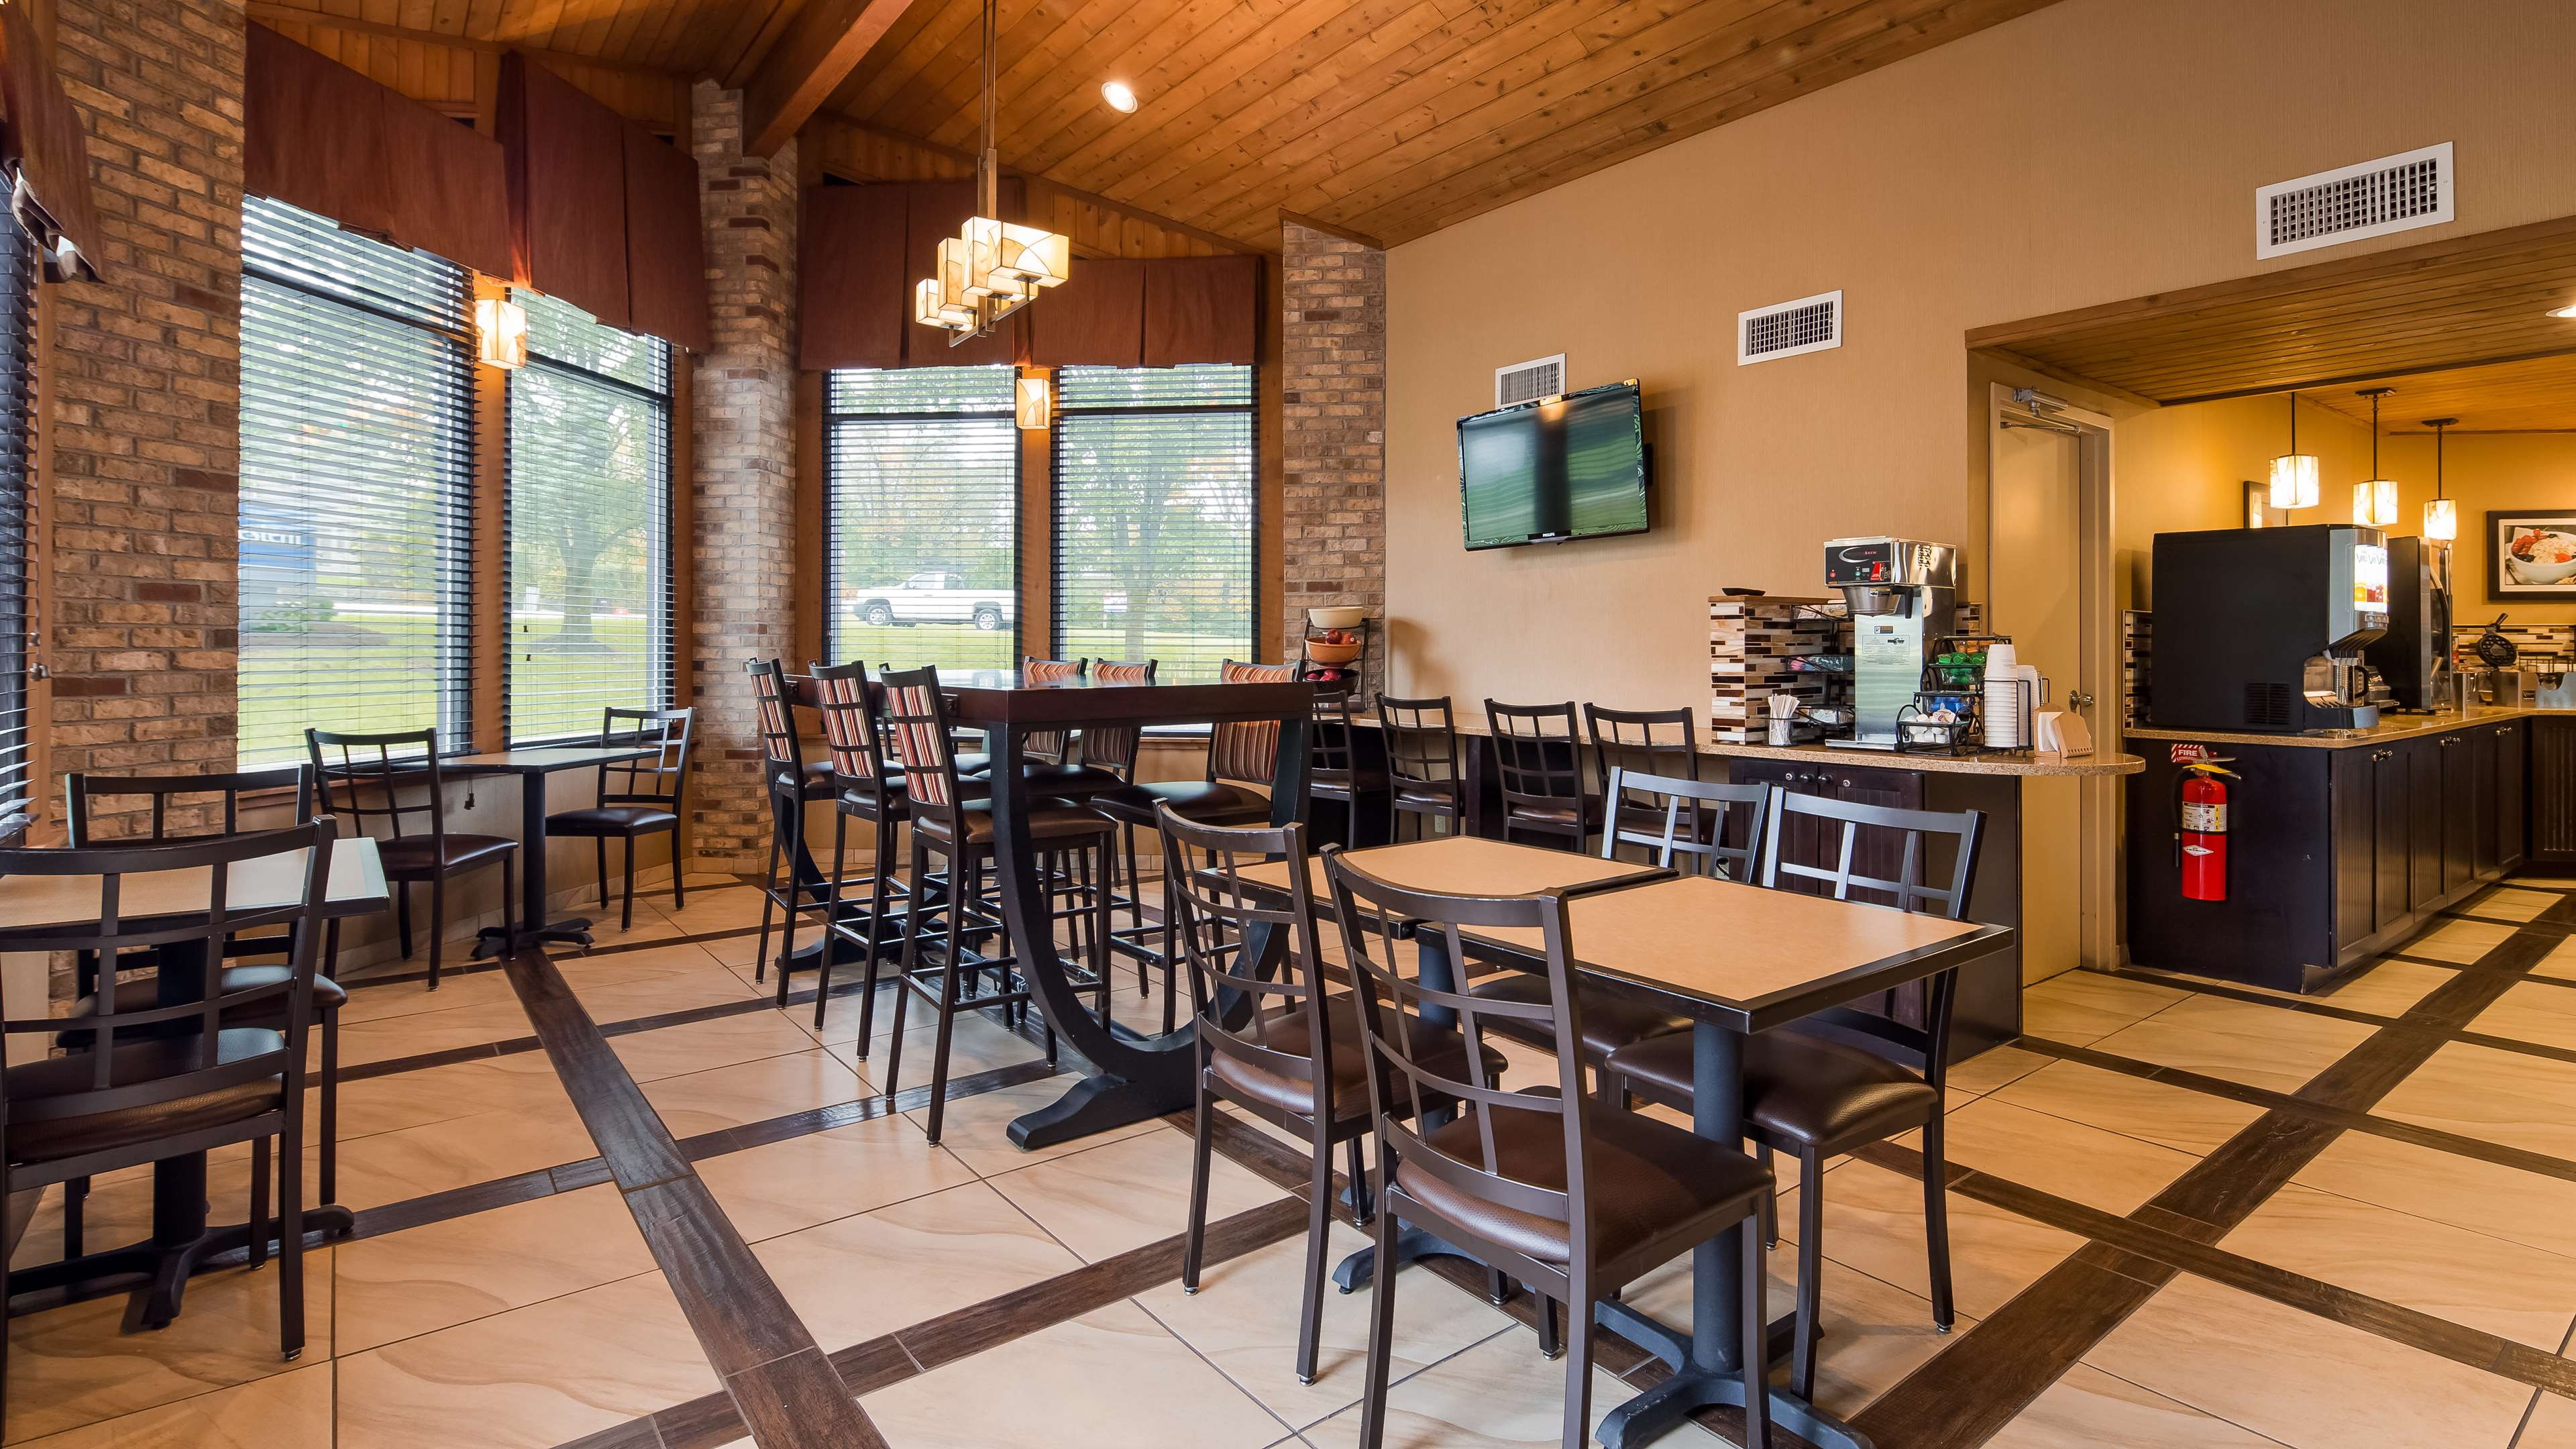 Best Western Sycamore Inn image 7